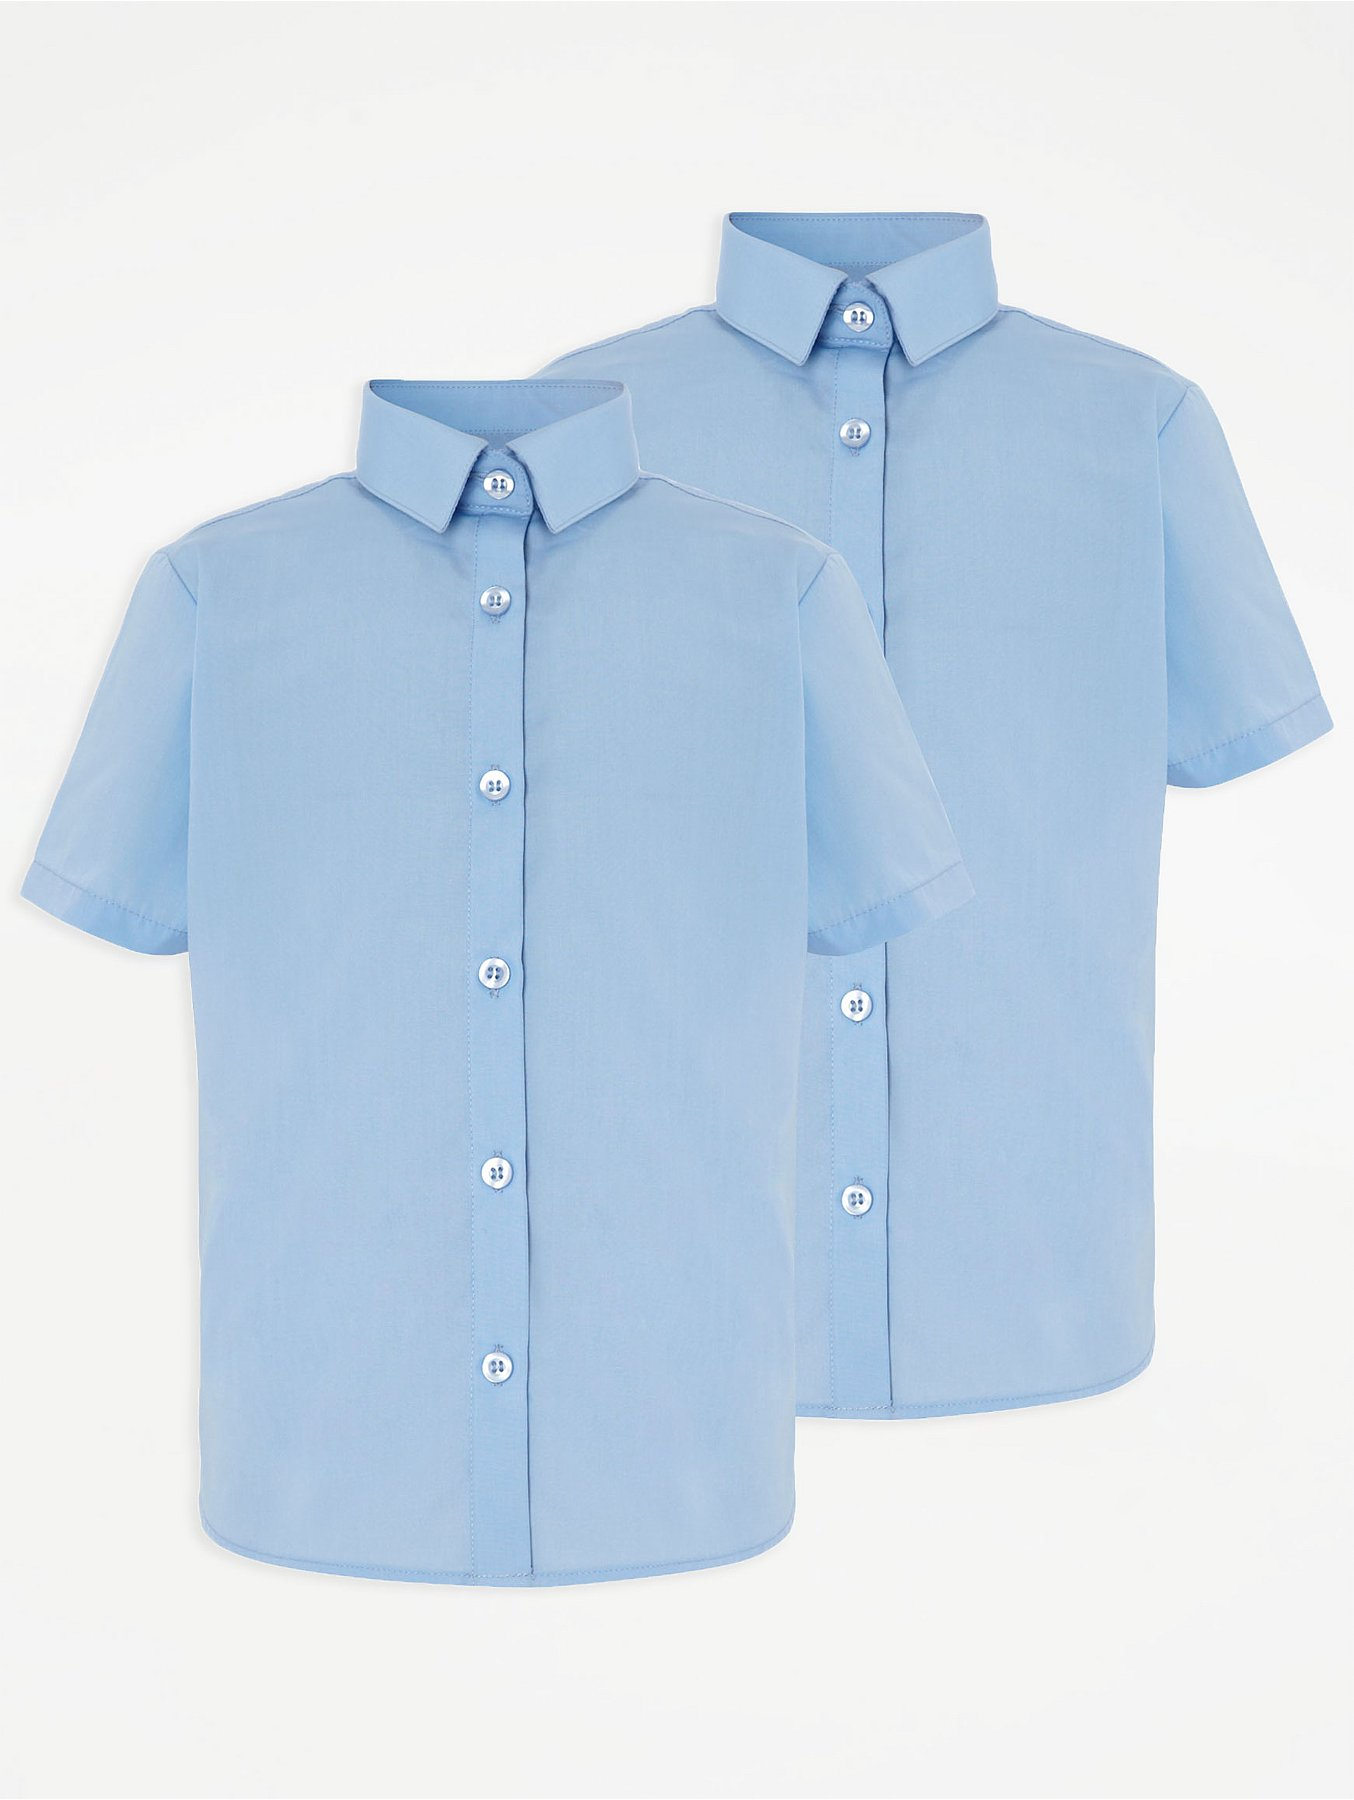 Girls Light Blue School Short Sleeve Shirt 2 Pack School George